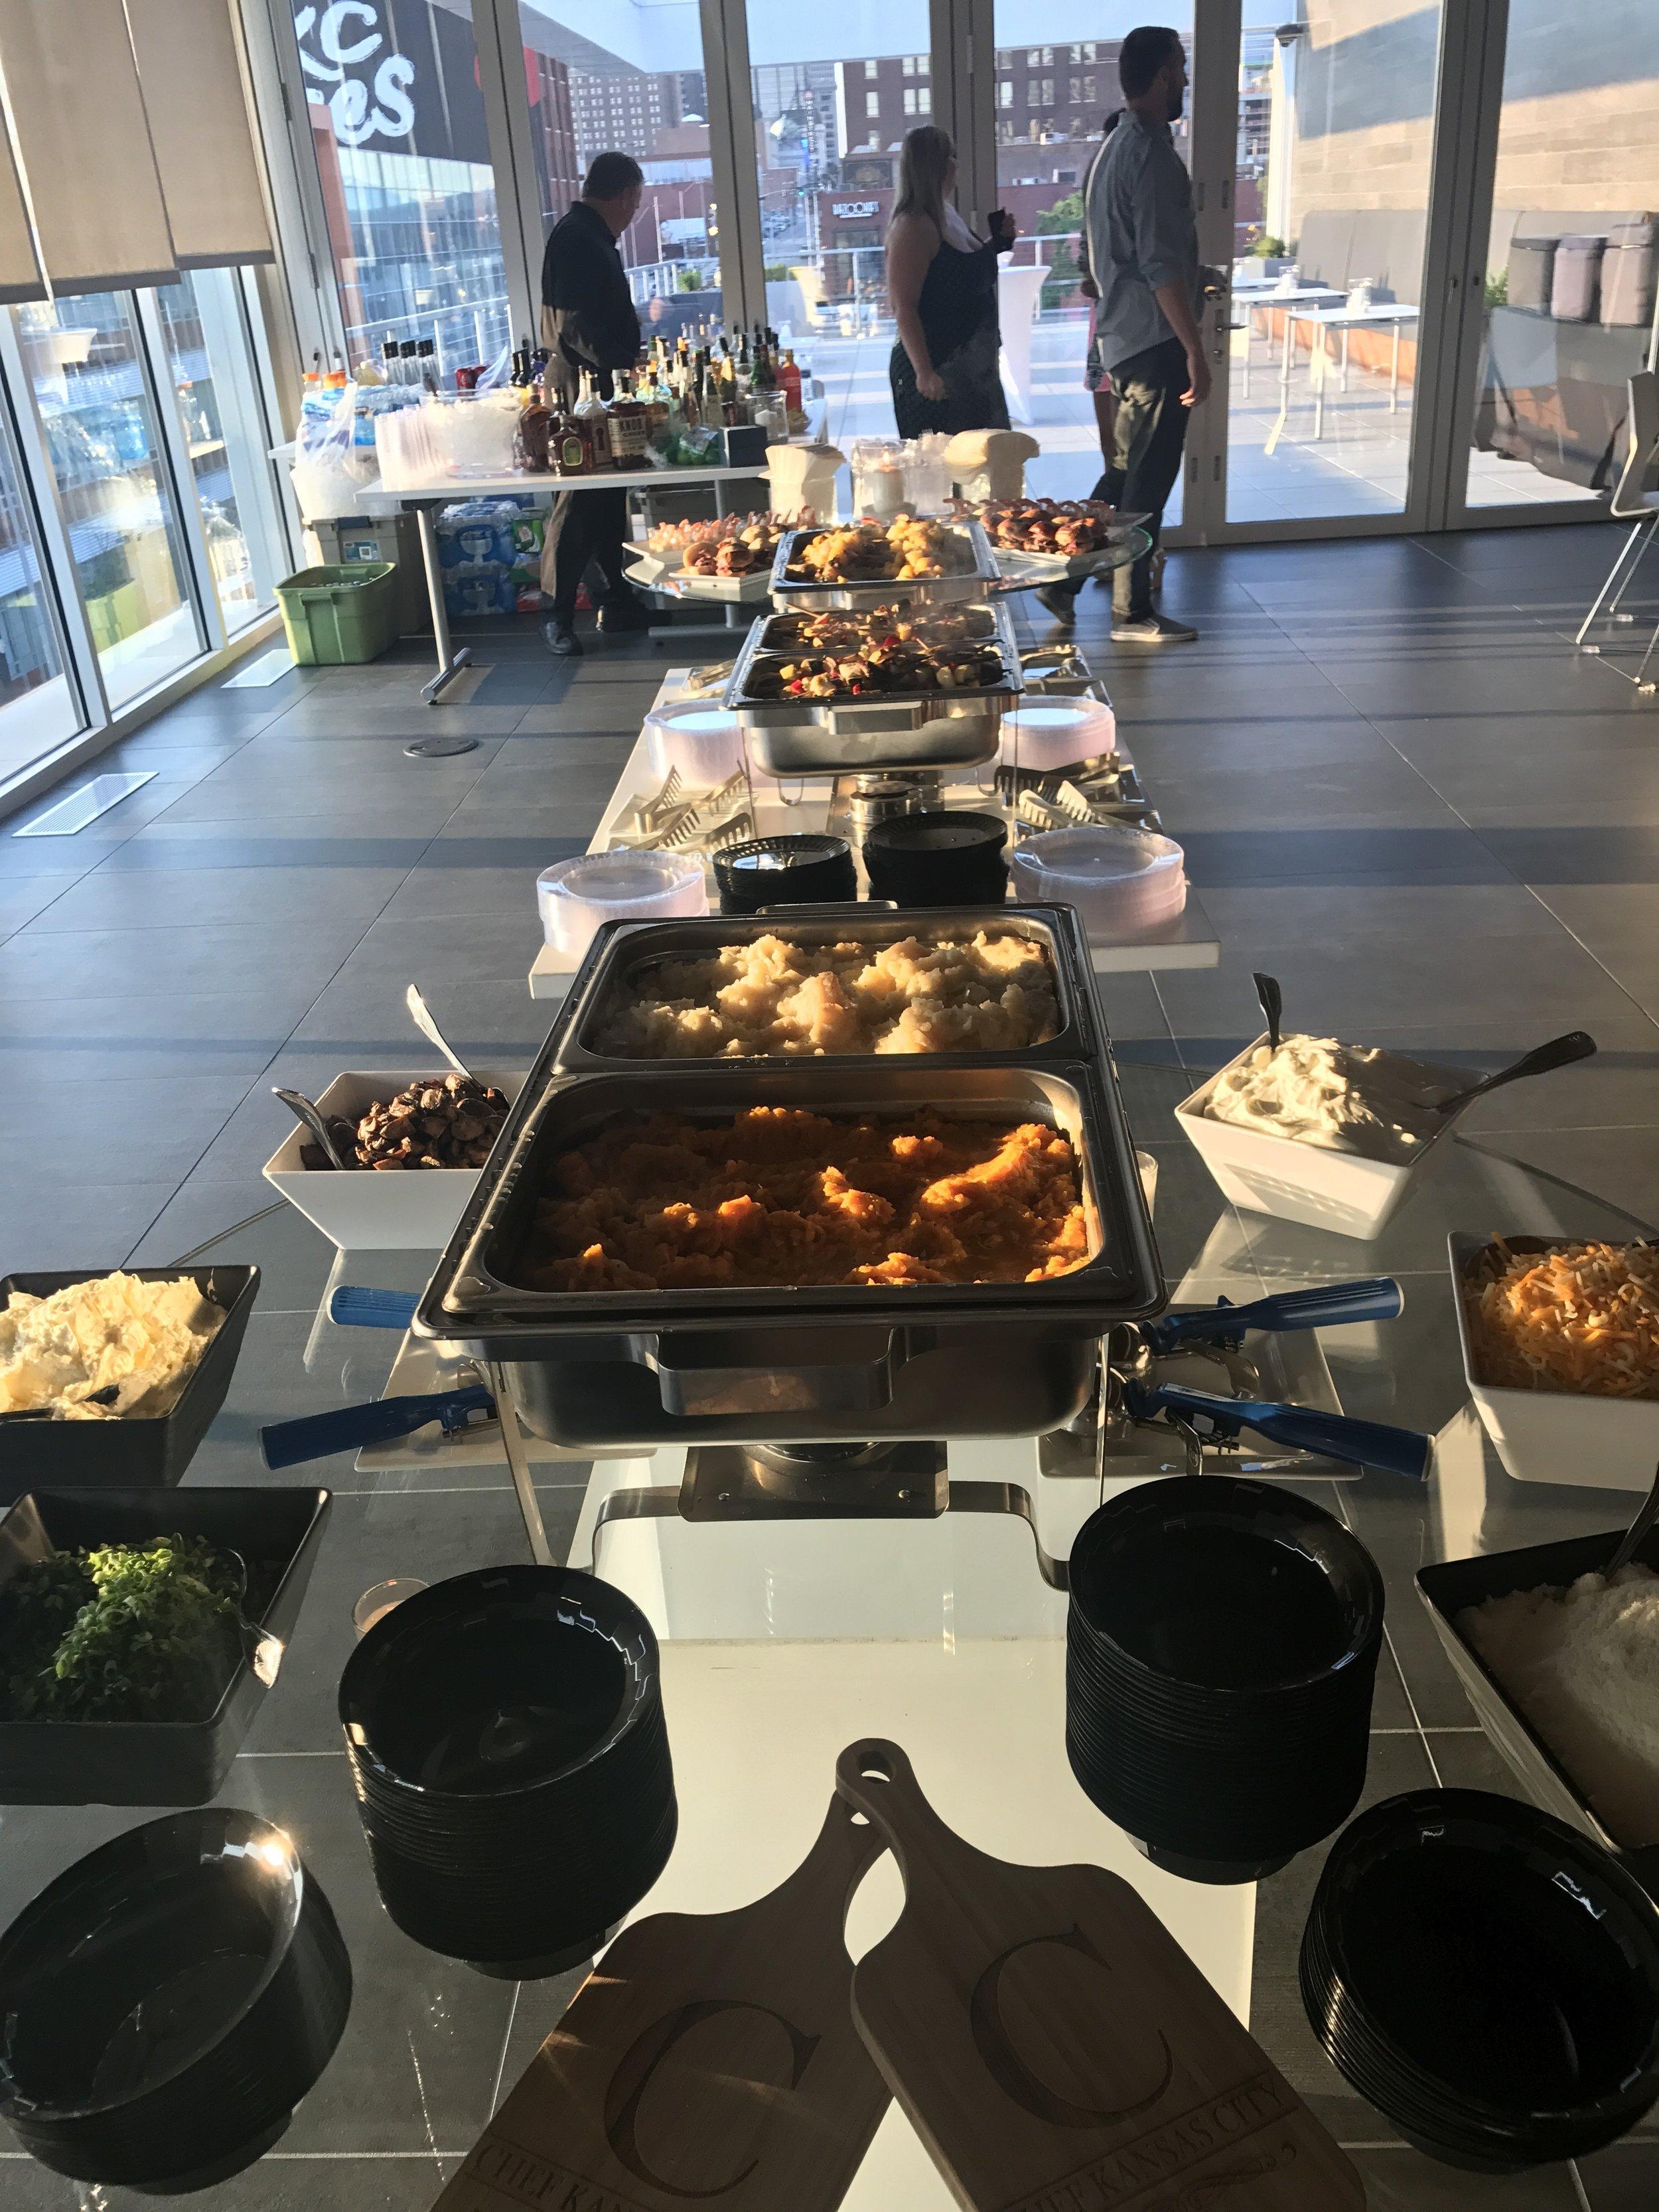 box-lunches-breakfast-buffett-appetizers-full-buffett-office-catering-lenexa-mission-hills-plaza-kcmo-organic4.jpg